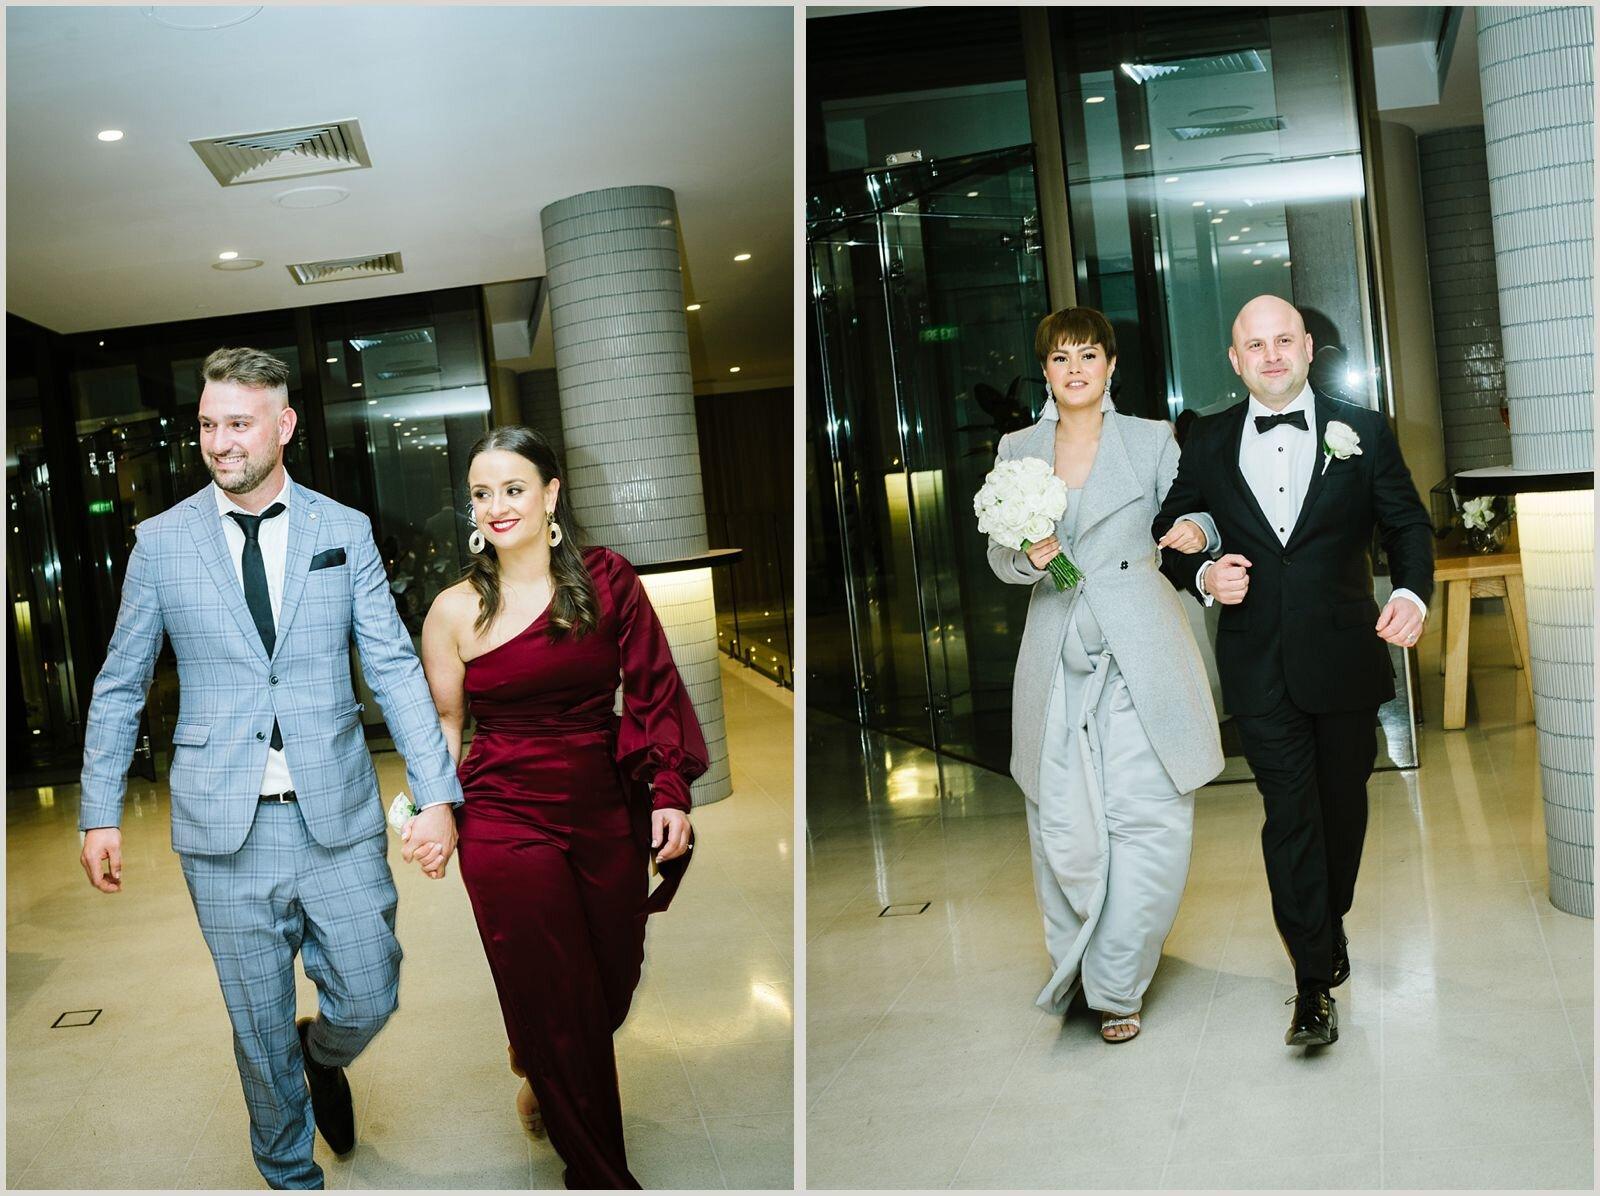 joseph_koprek_wedding_melbourne_the_prince_deck_0075.jpg